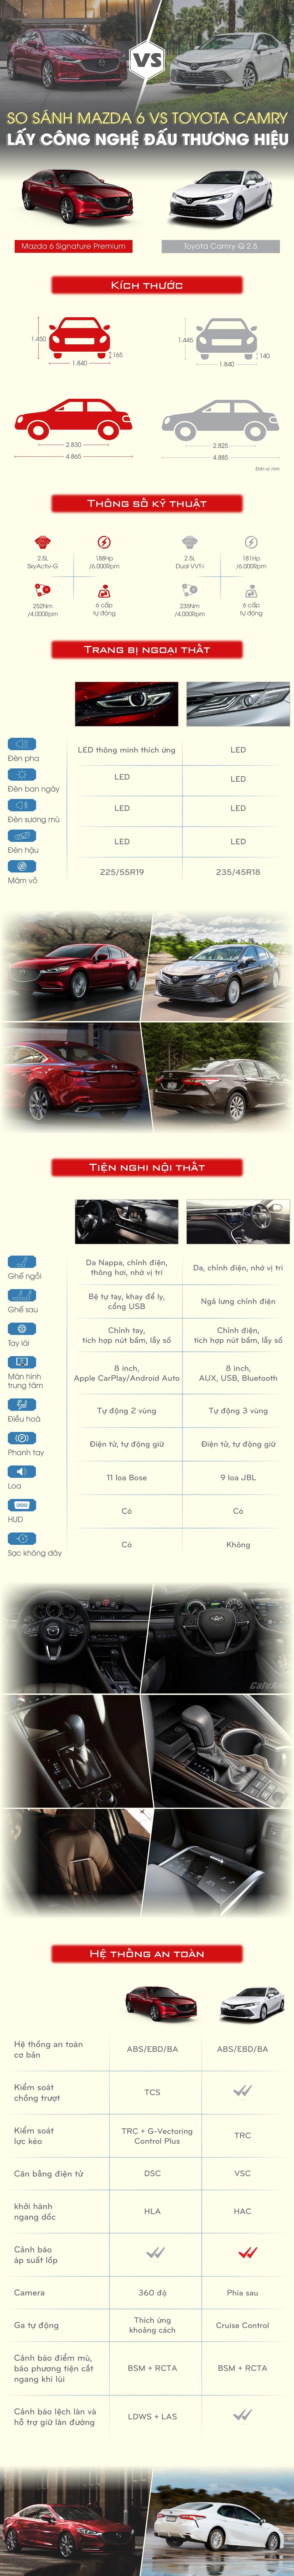 mazda-6-vs-toyota-camry-lay-cong-nghe-dau-thuong-hieu